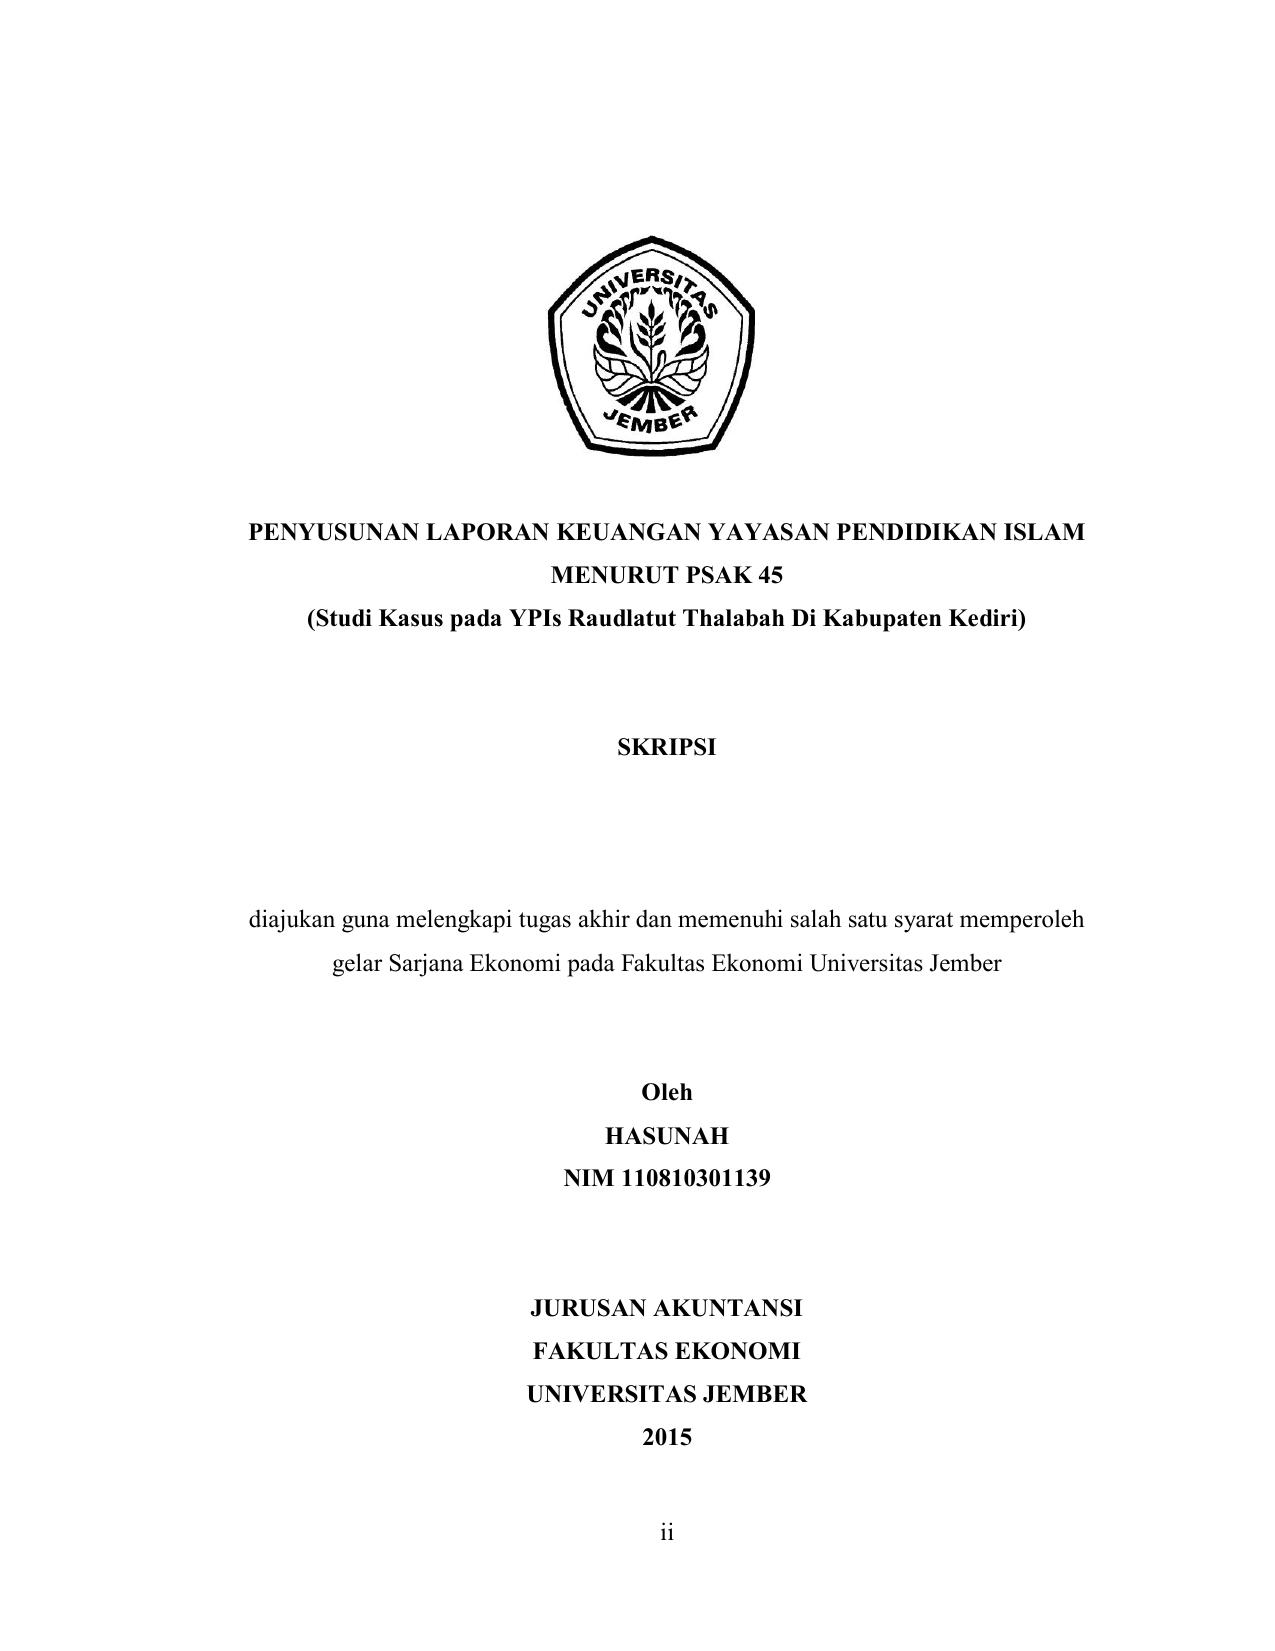 Ii Penyusunan Laporan Keuangan Yayasan Pendidikan